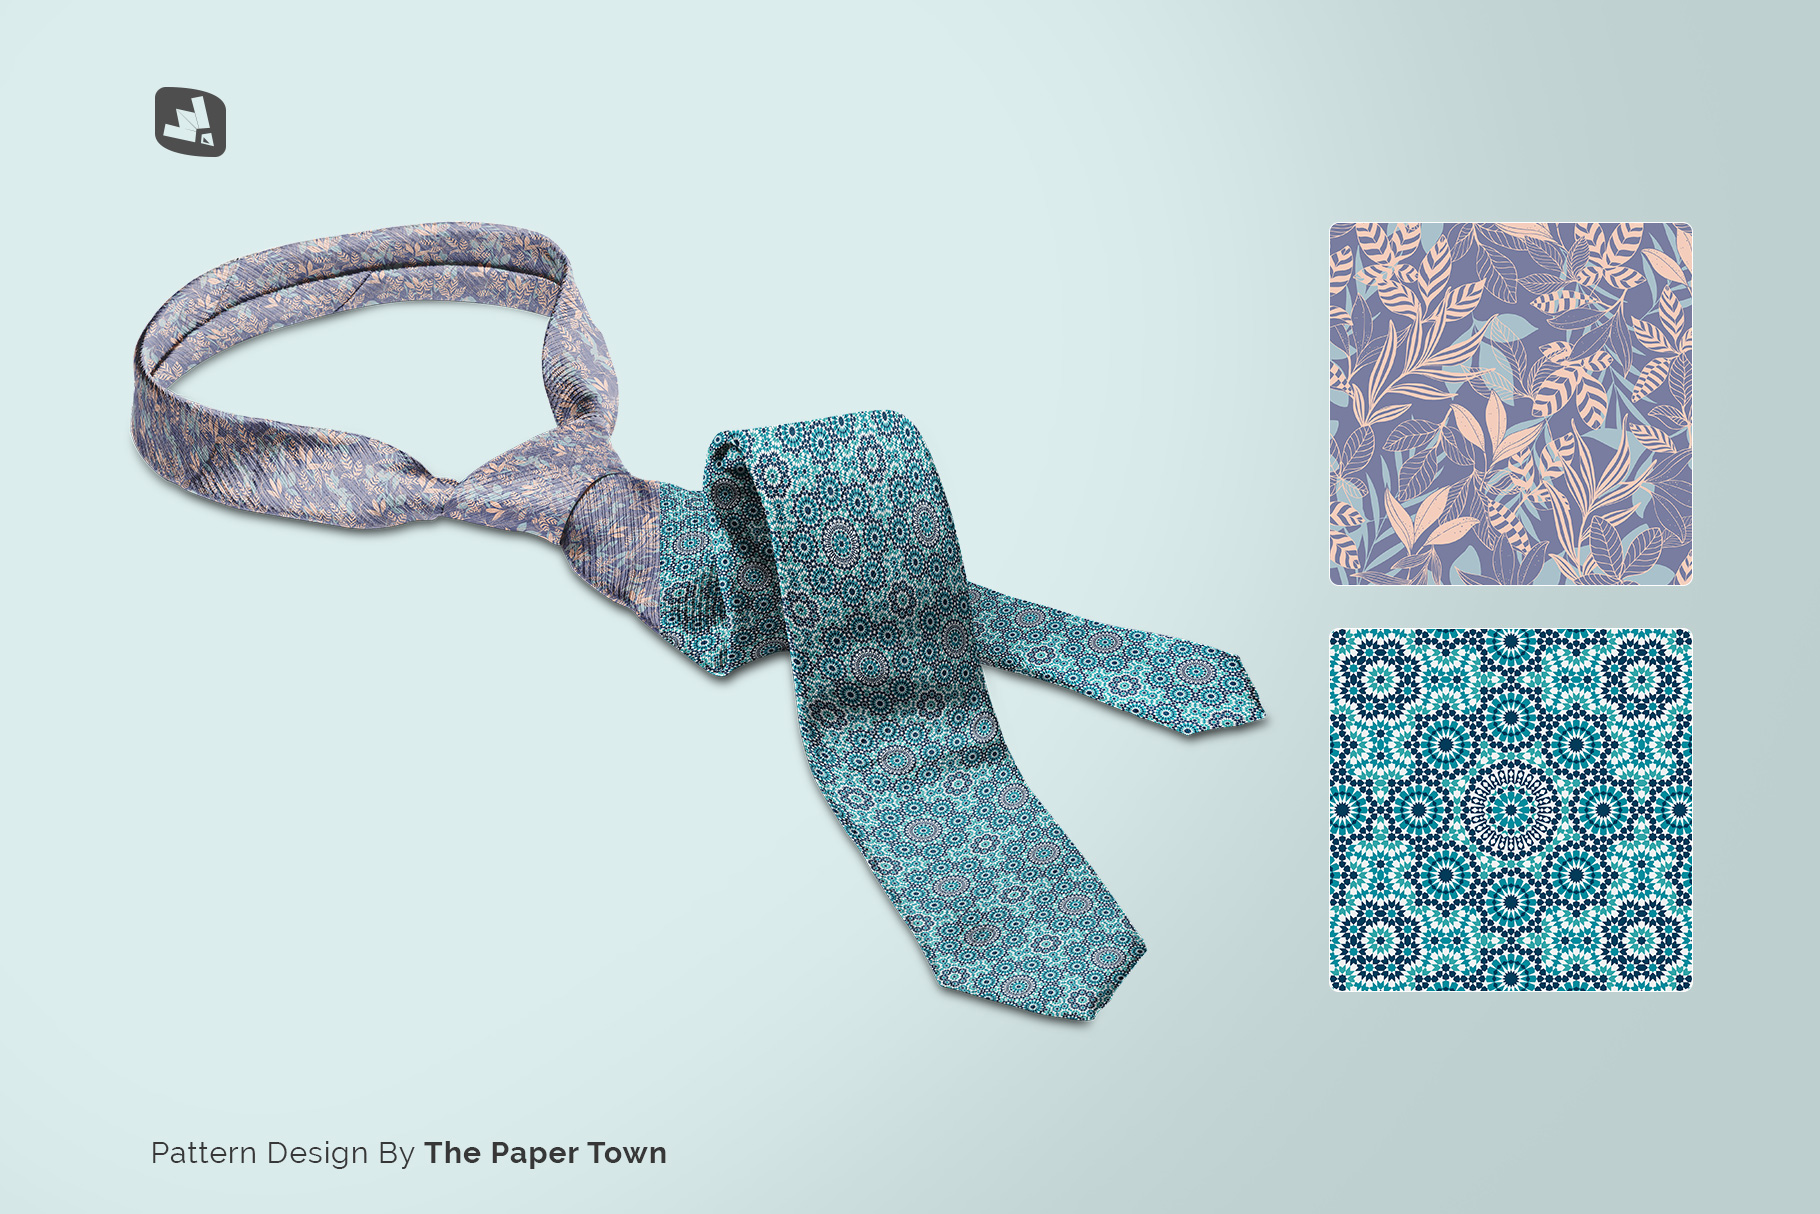 designer's credit of the men's formal tie mockup